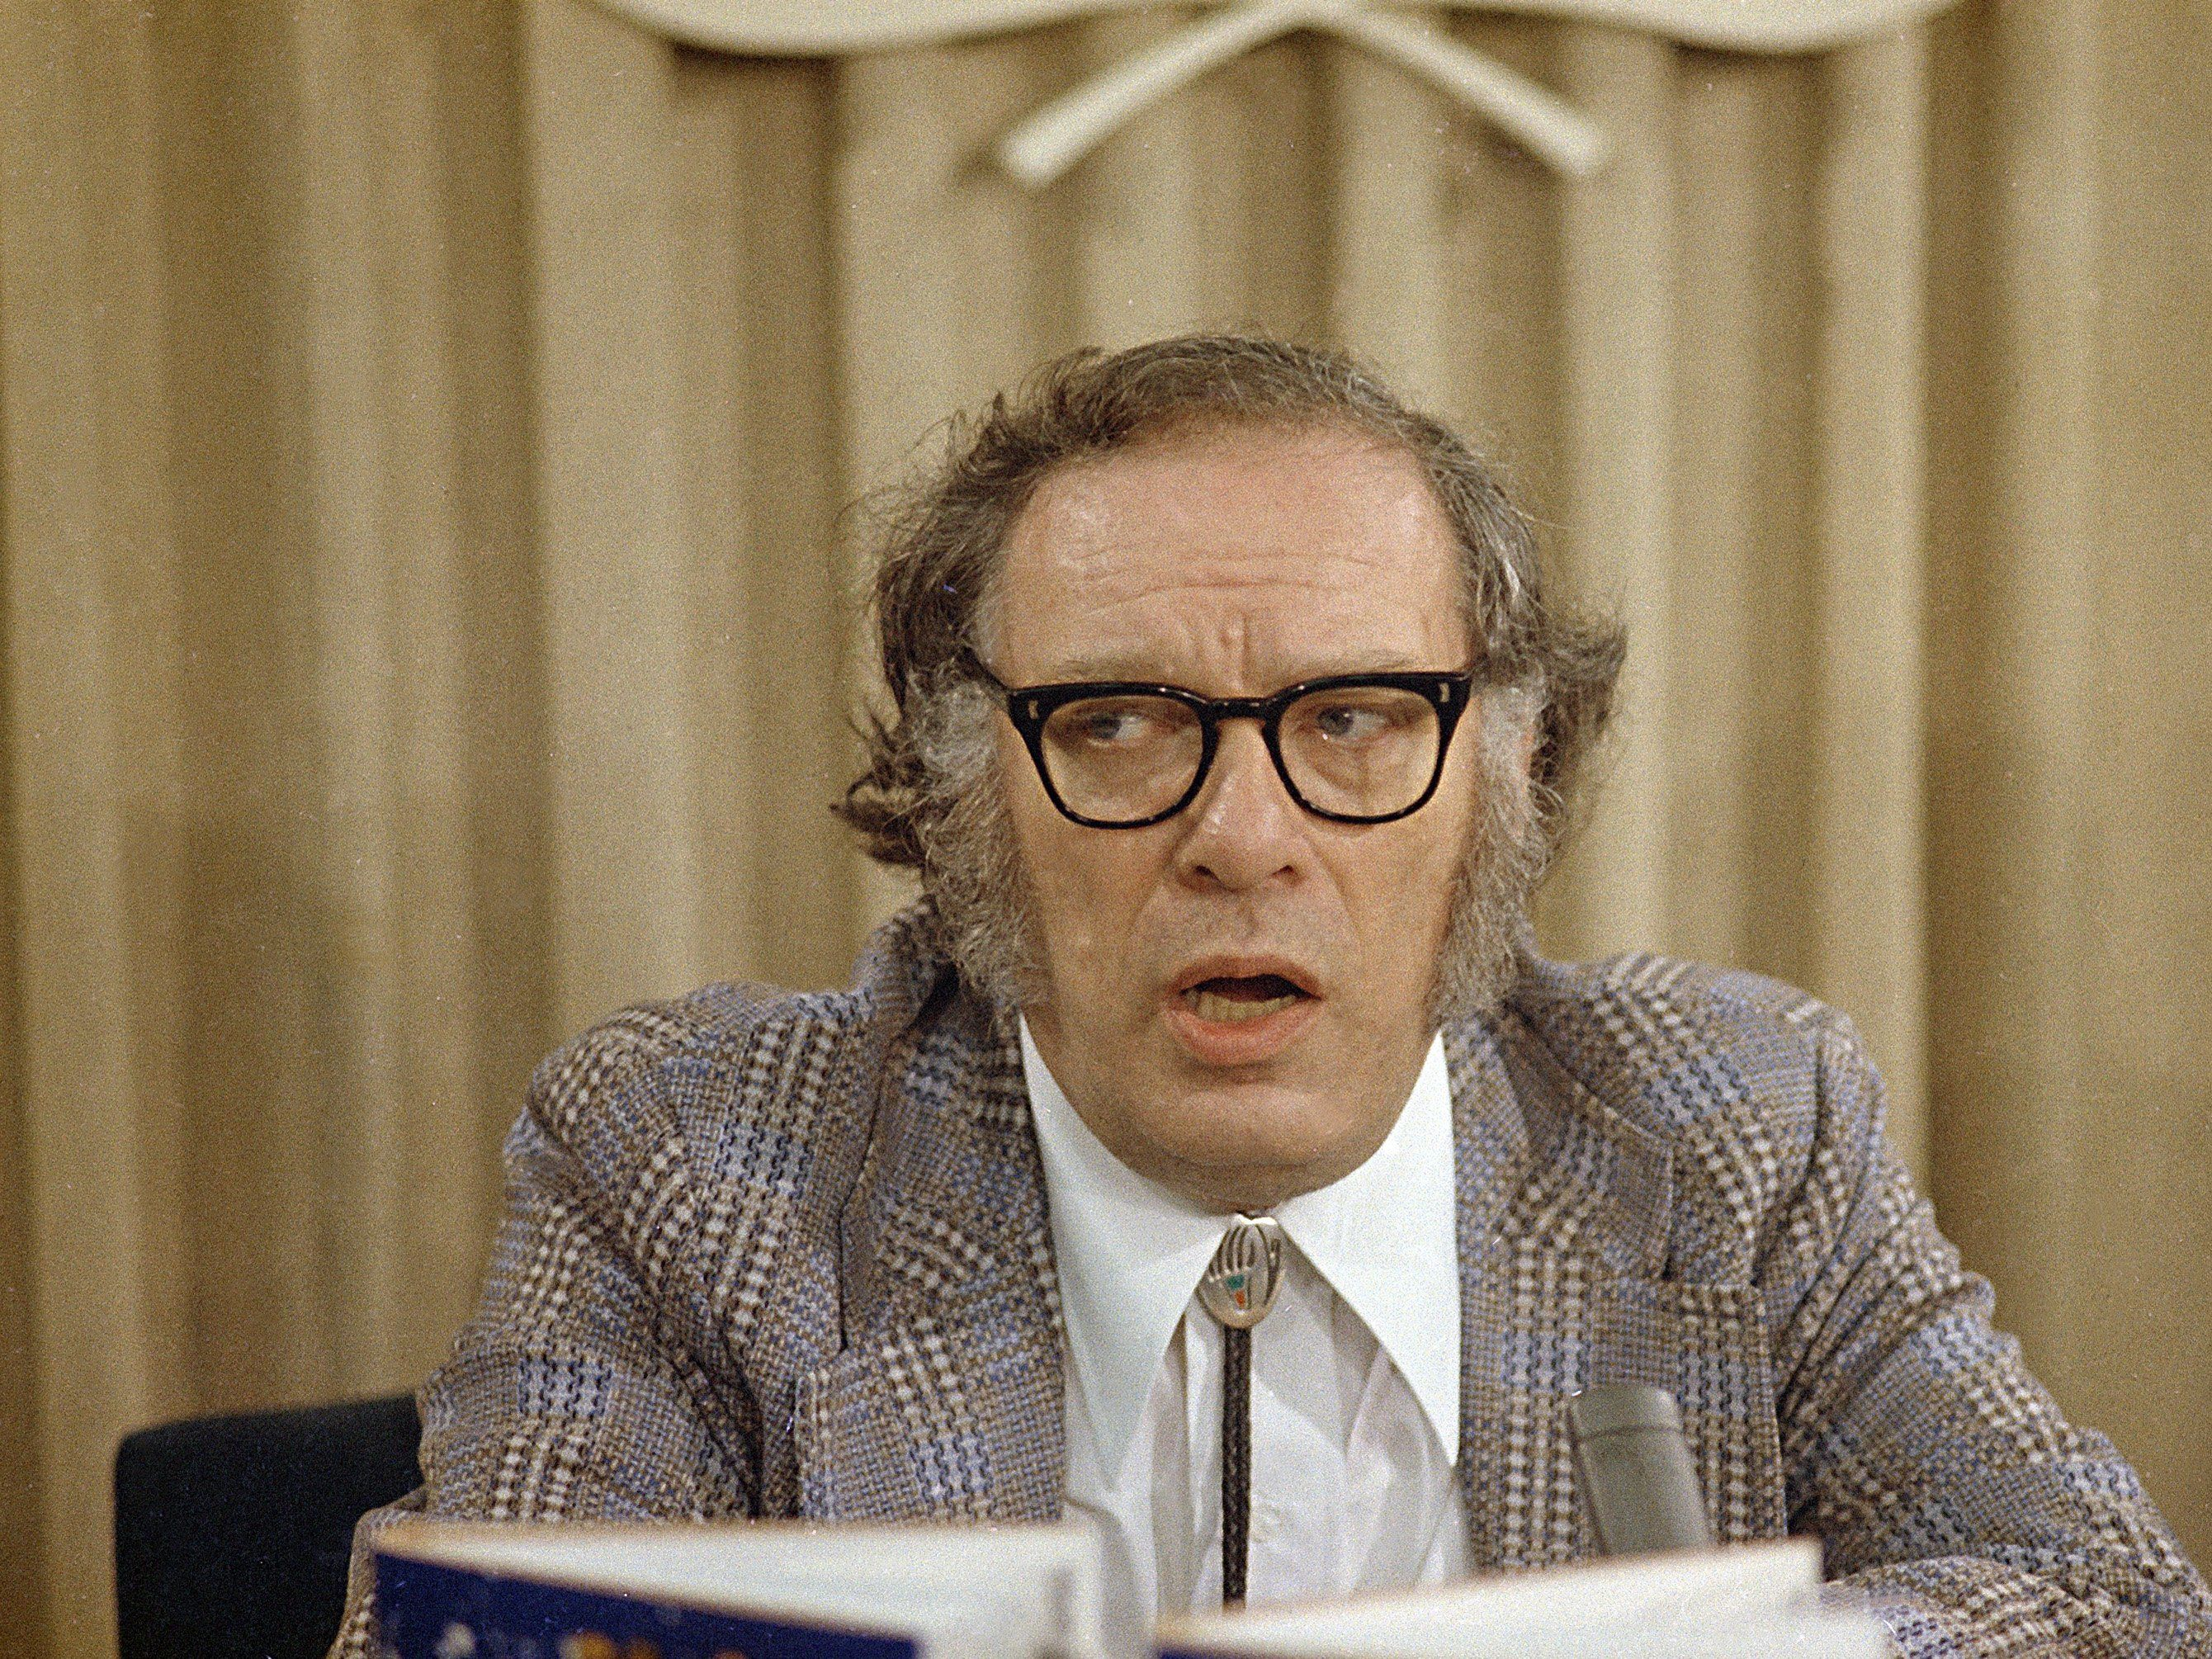 005 Image Essay Example Isaac Asimov Awful Essays On Creativity Intelligence Full